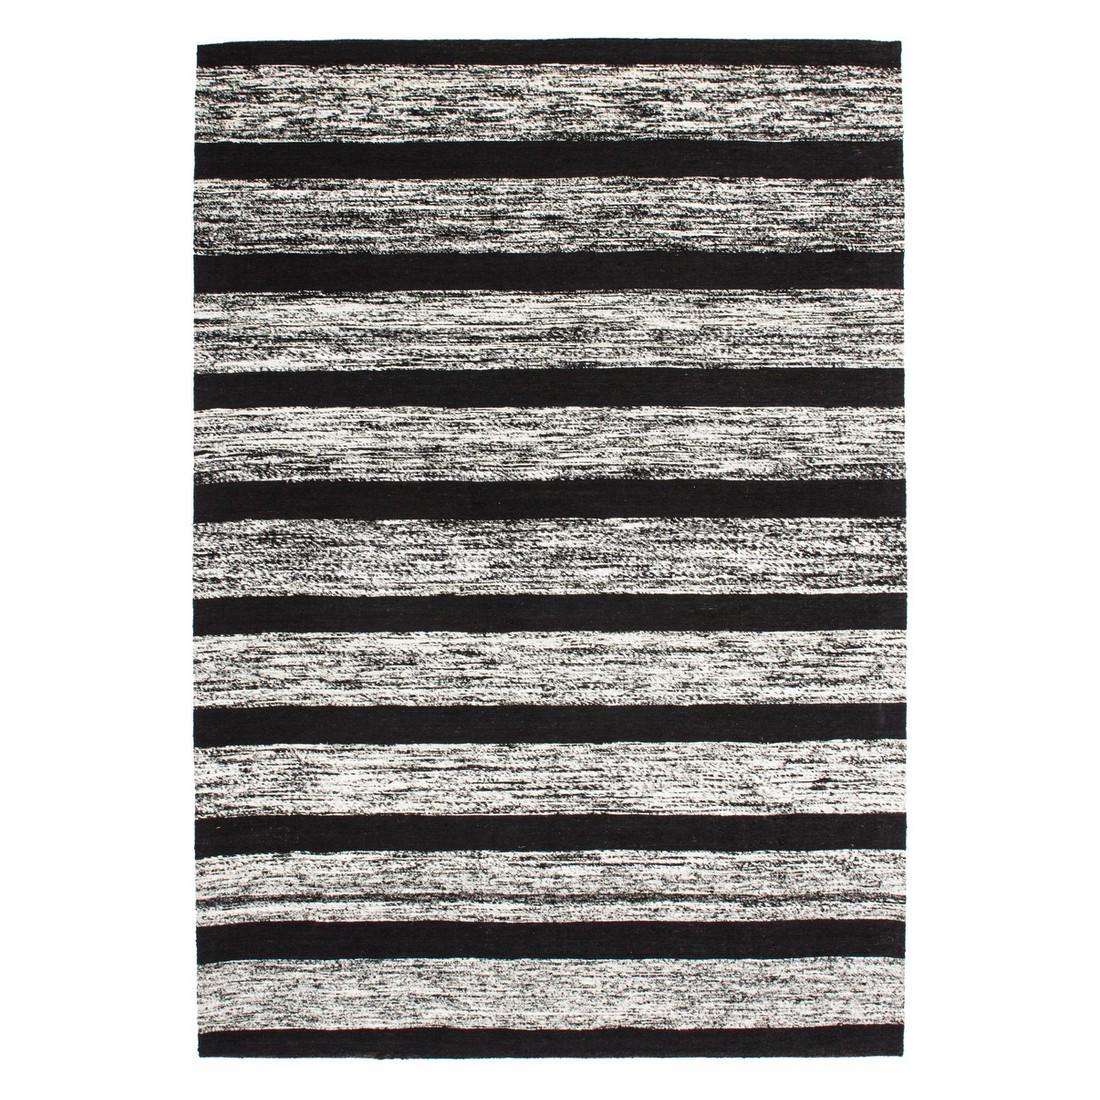 Teppich Madras – 160 x 230 cm, Obsession günstig kaufen